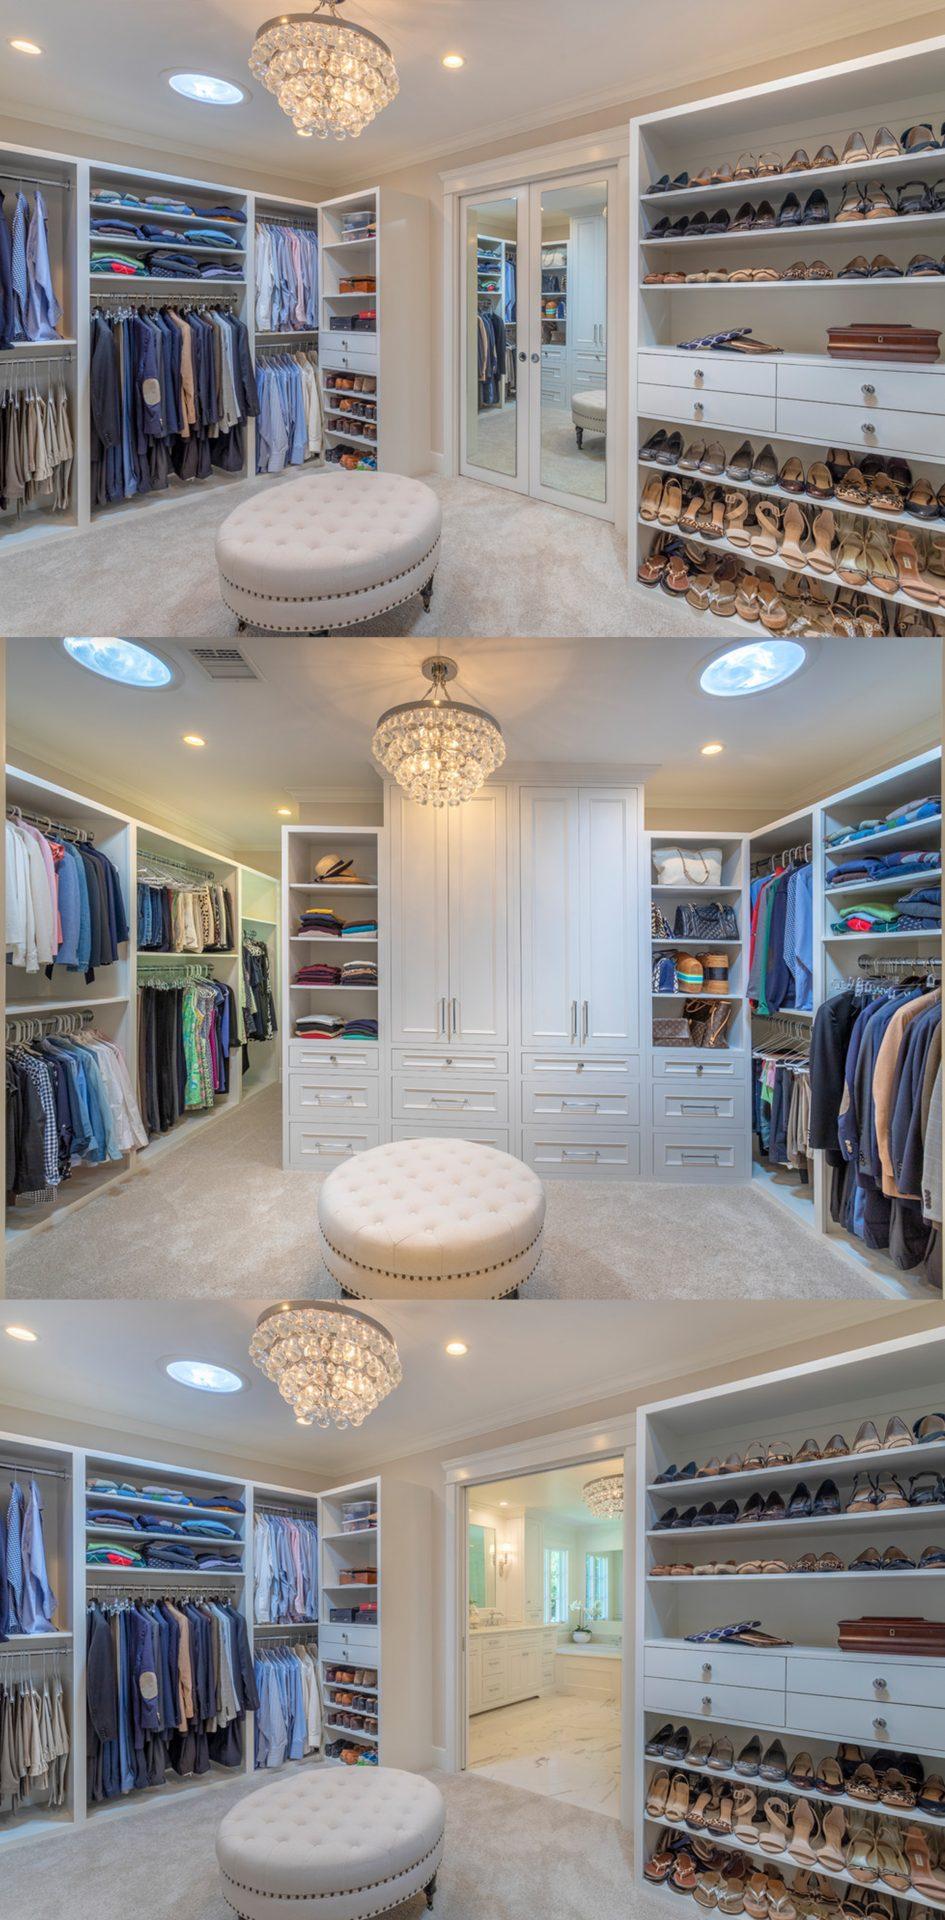 Get your closet under control